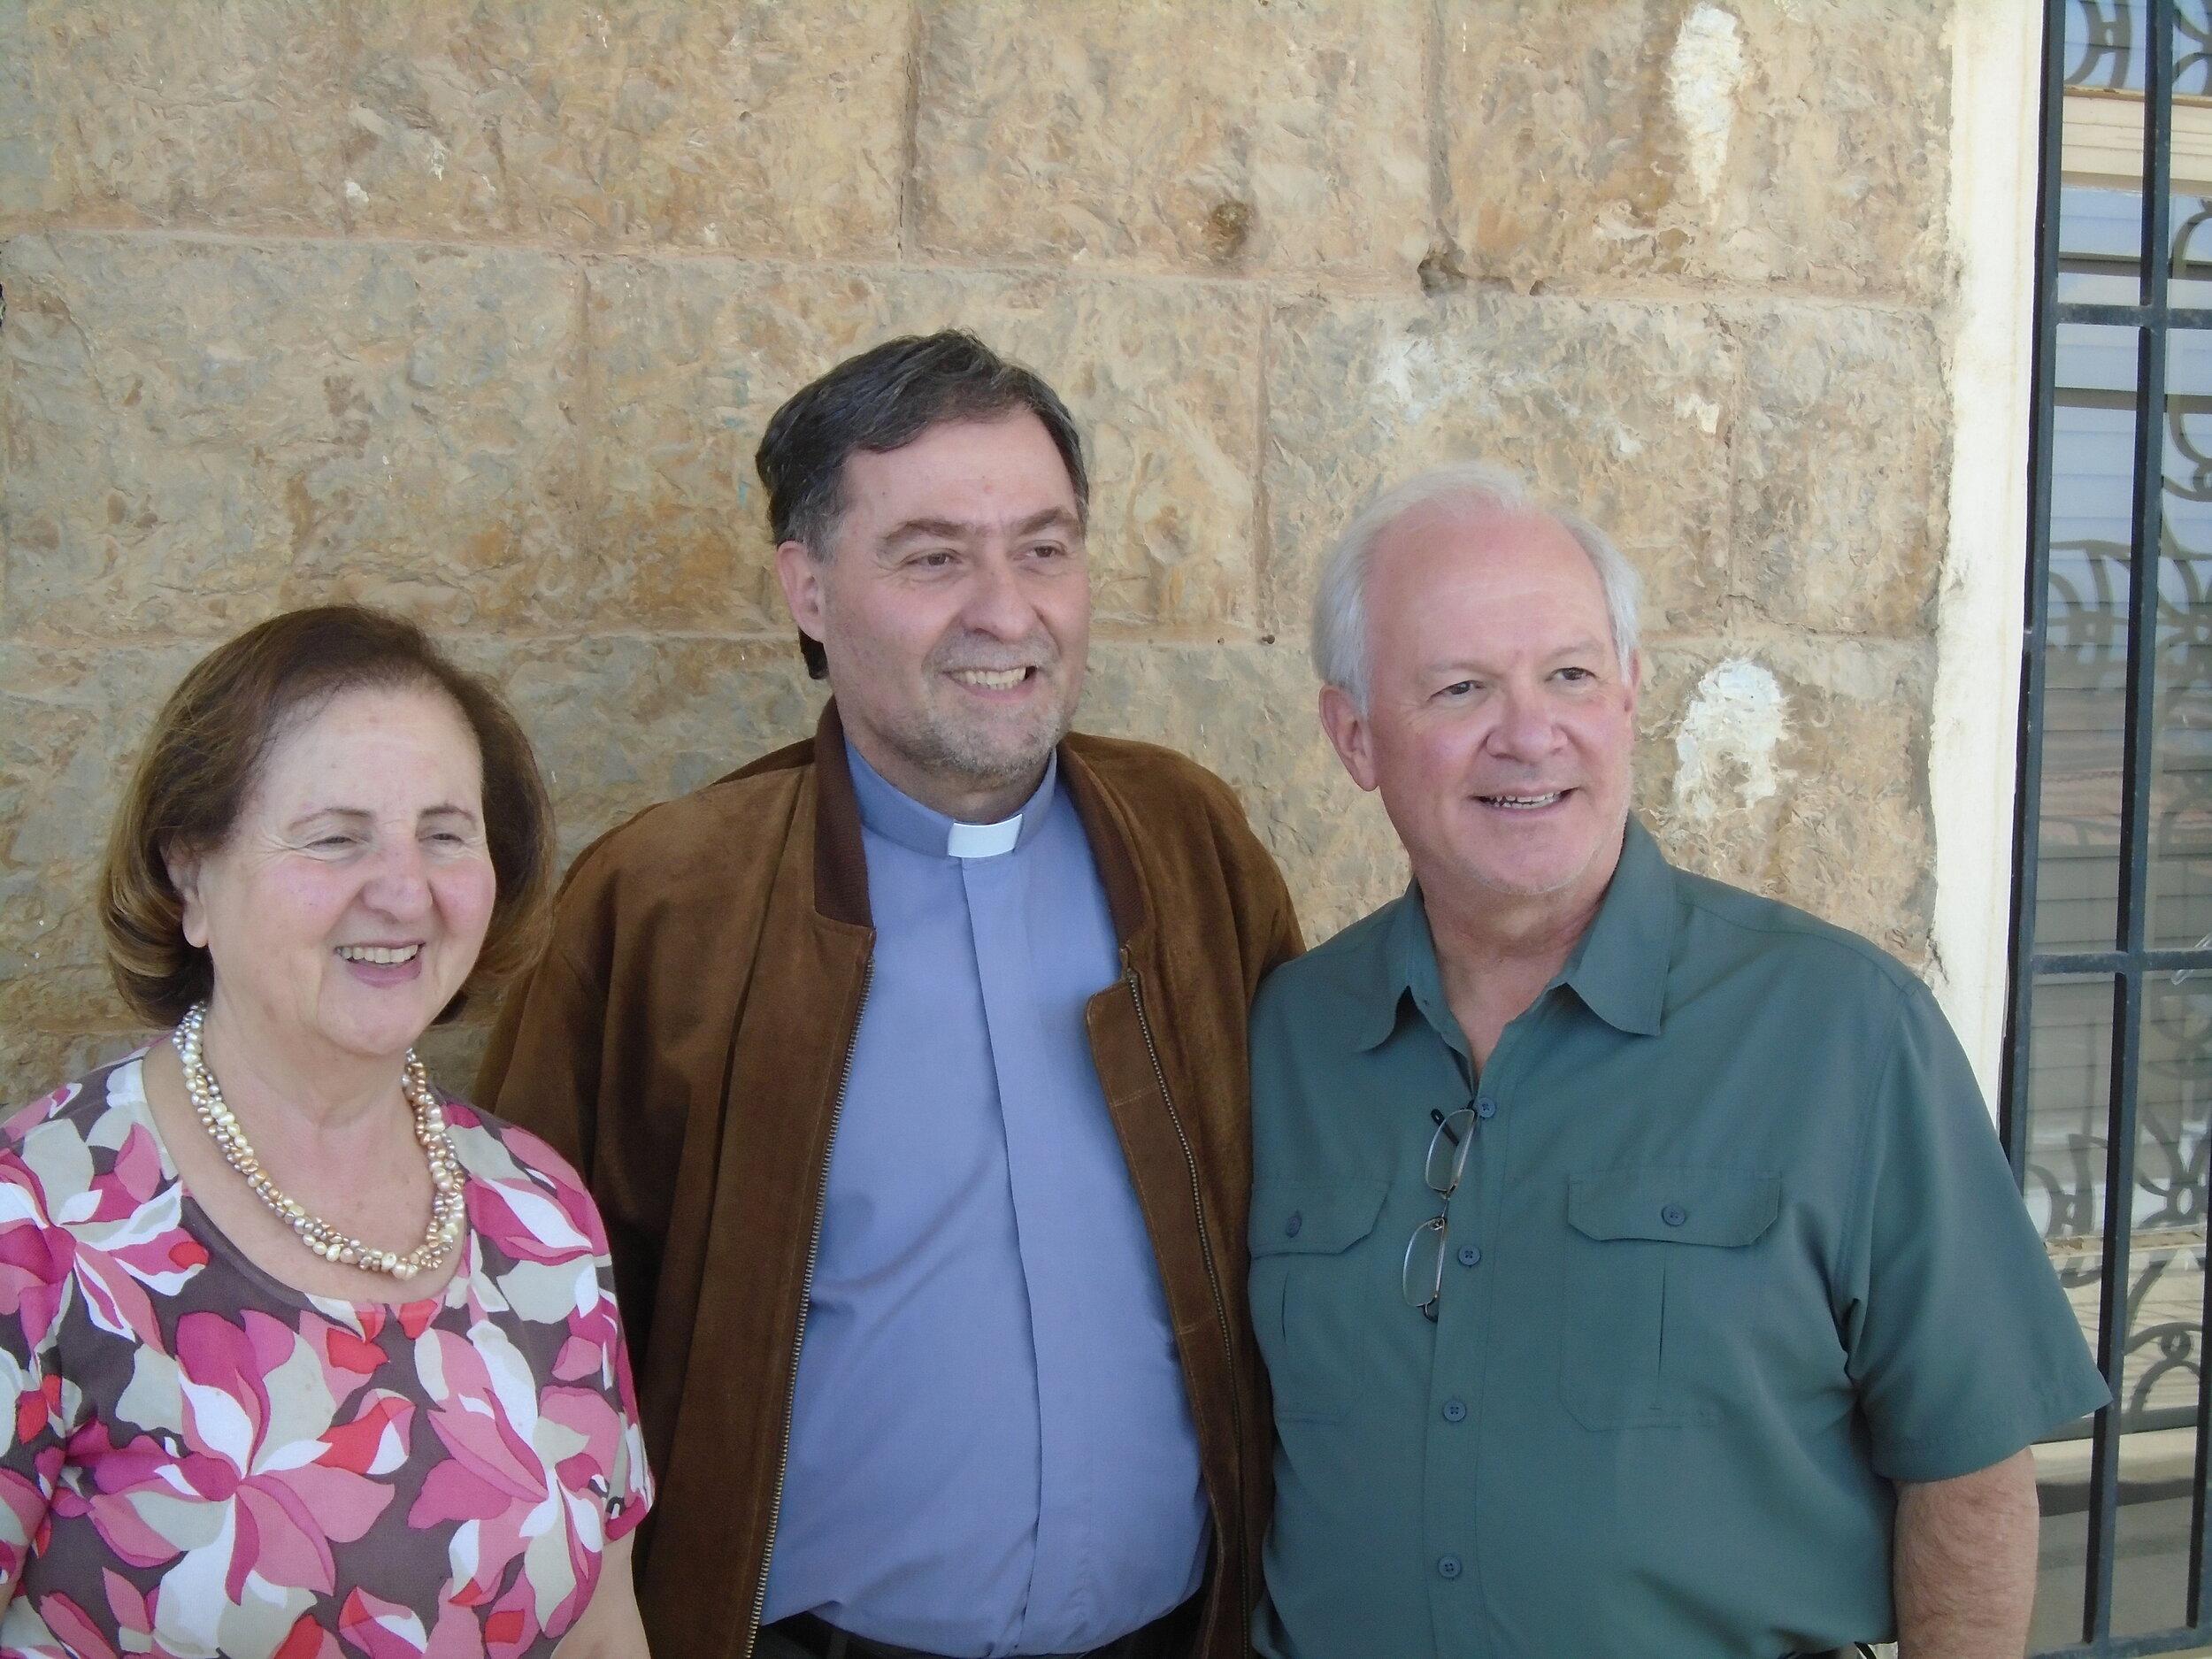 Mary Mikhael of NESSL, Assis Tony Aboud, Rev. Jack Baca